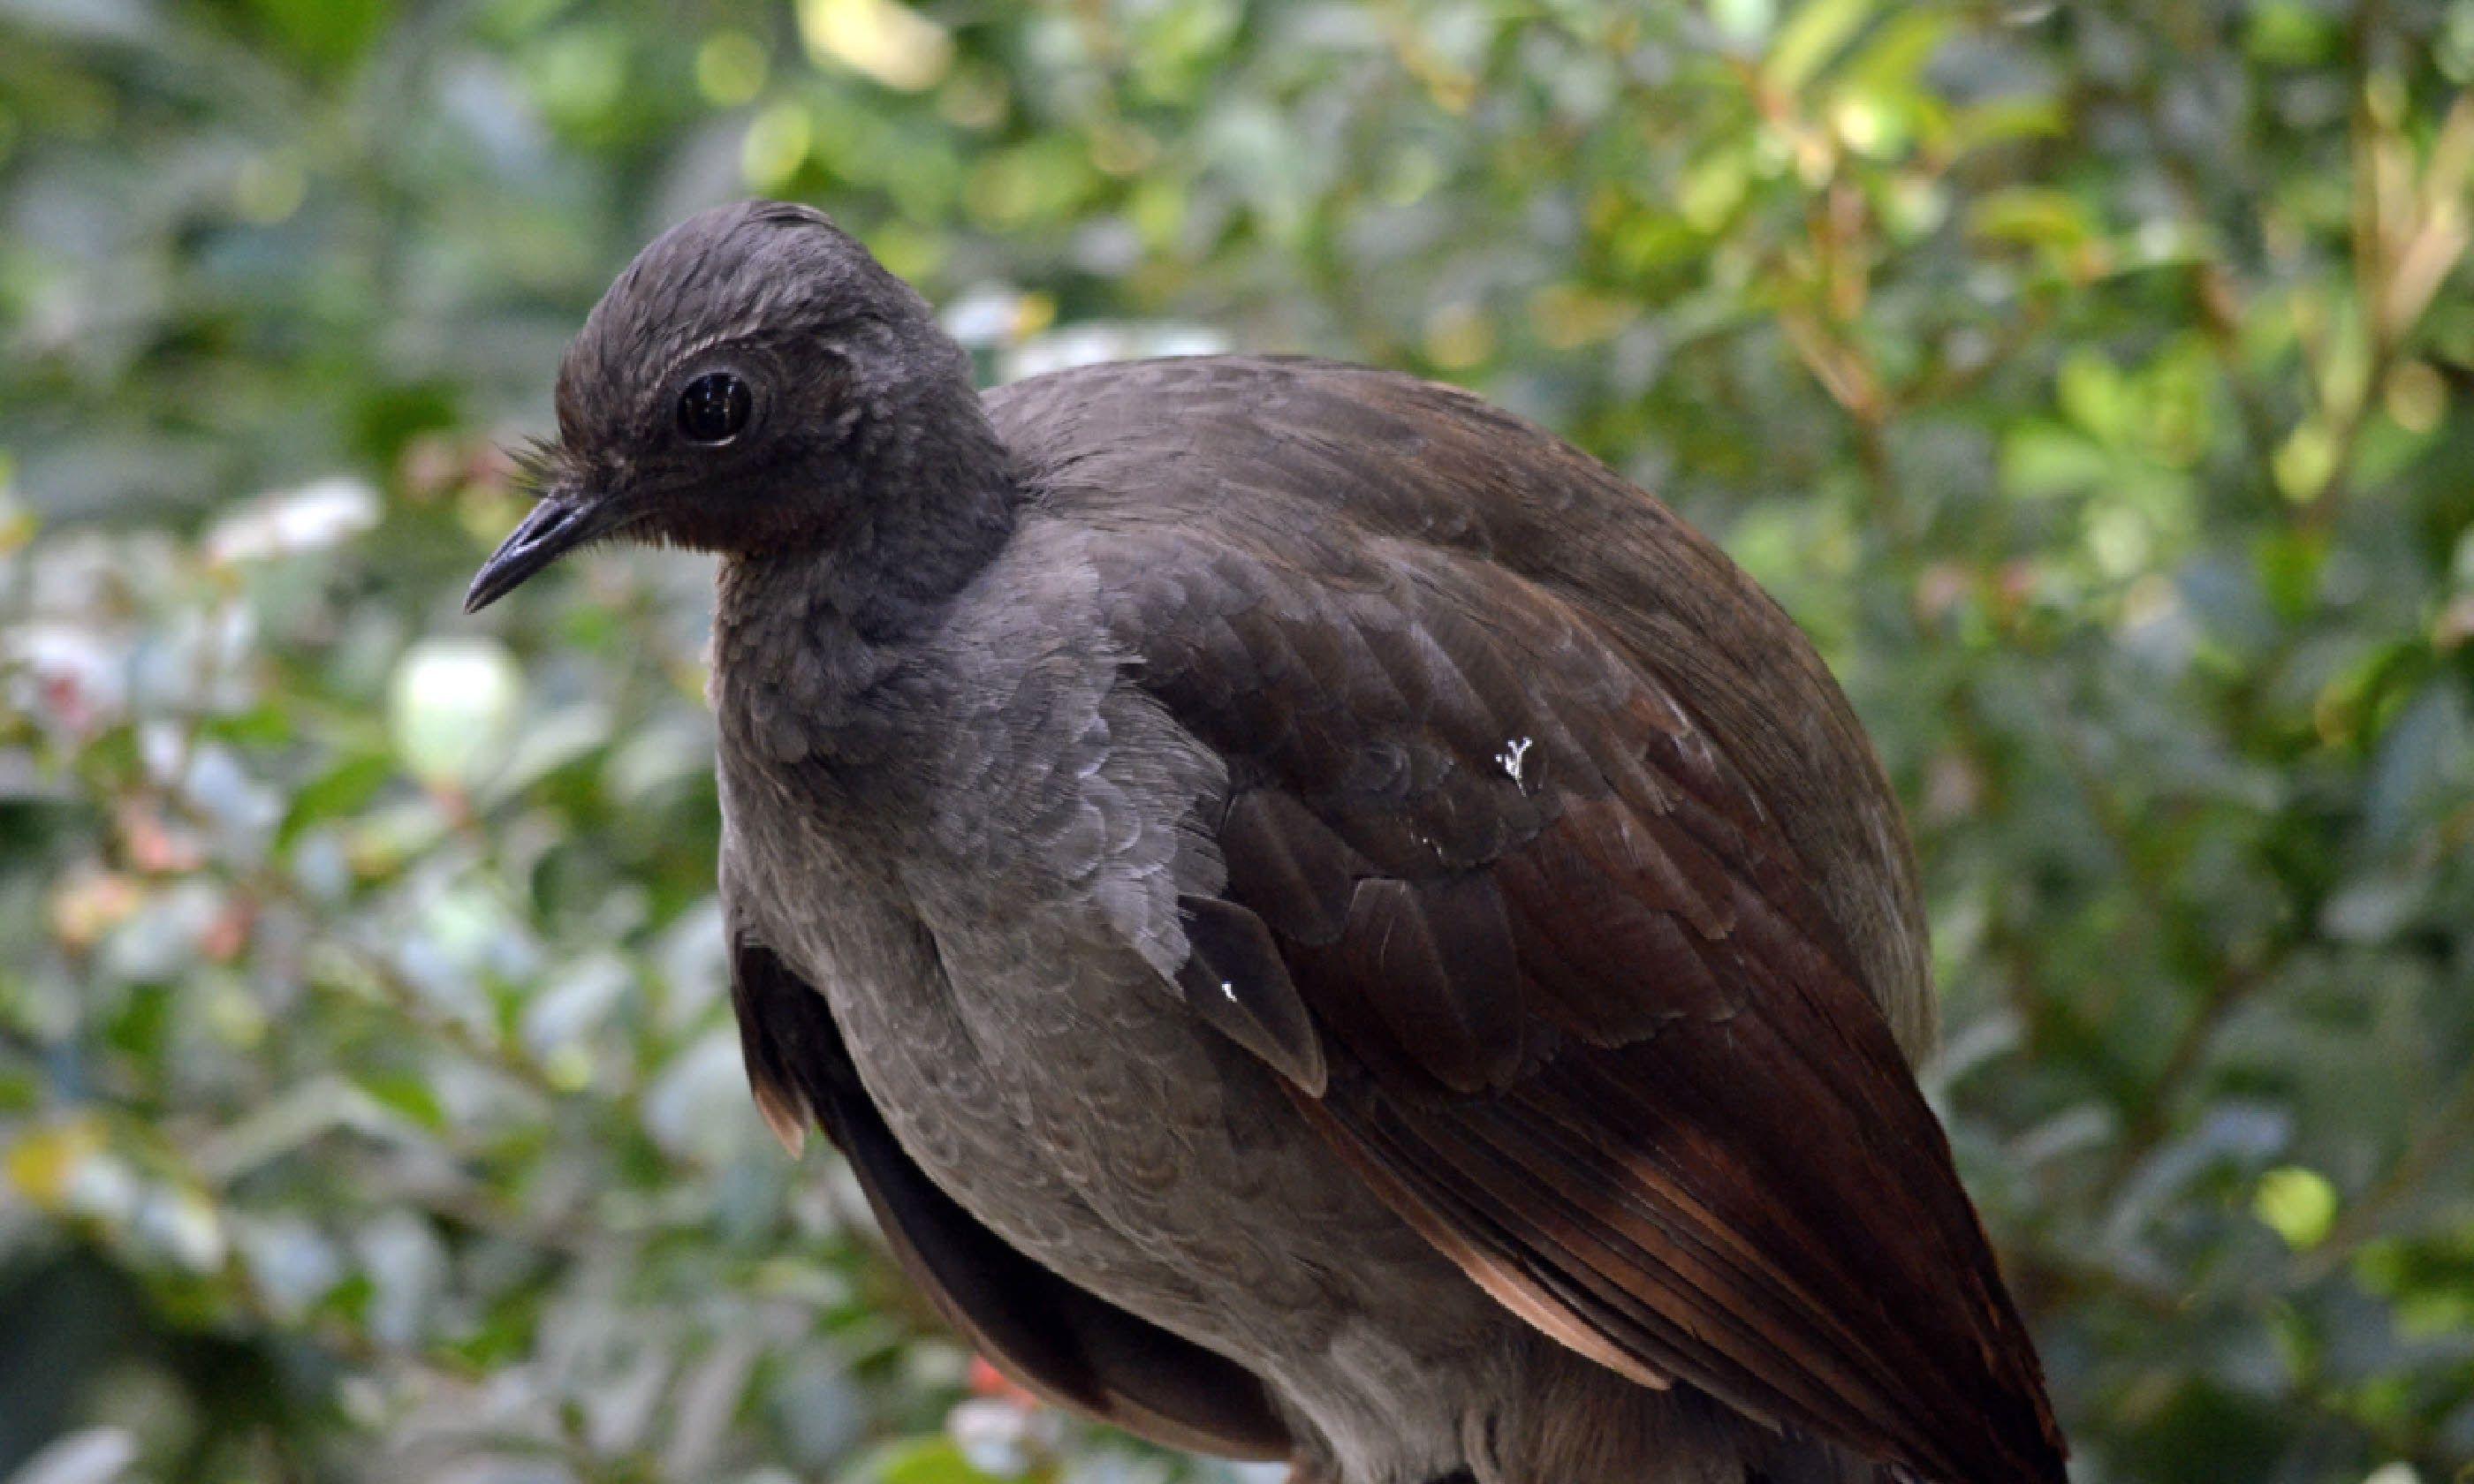 Lyre bird (Shutterstock)